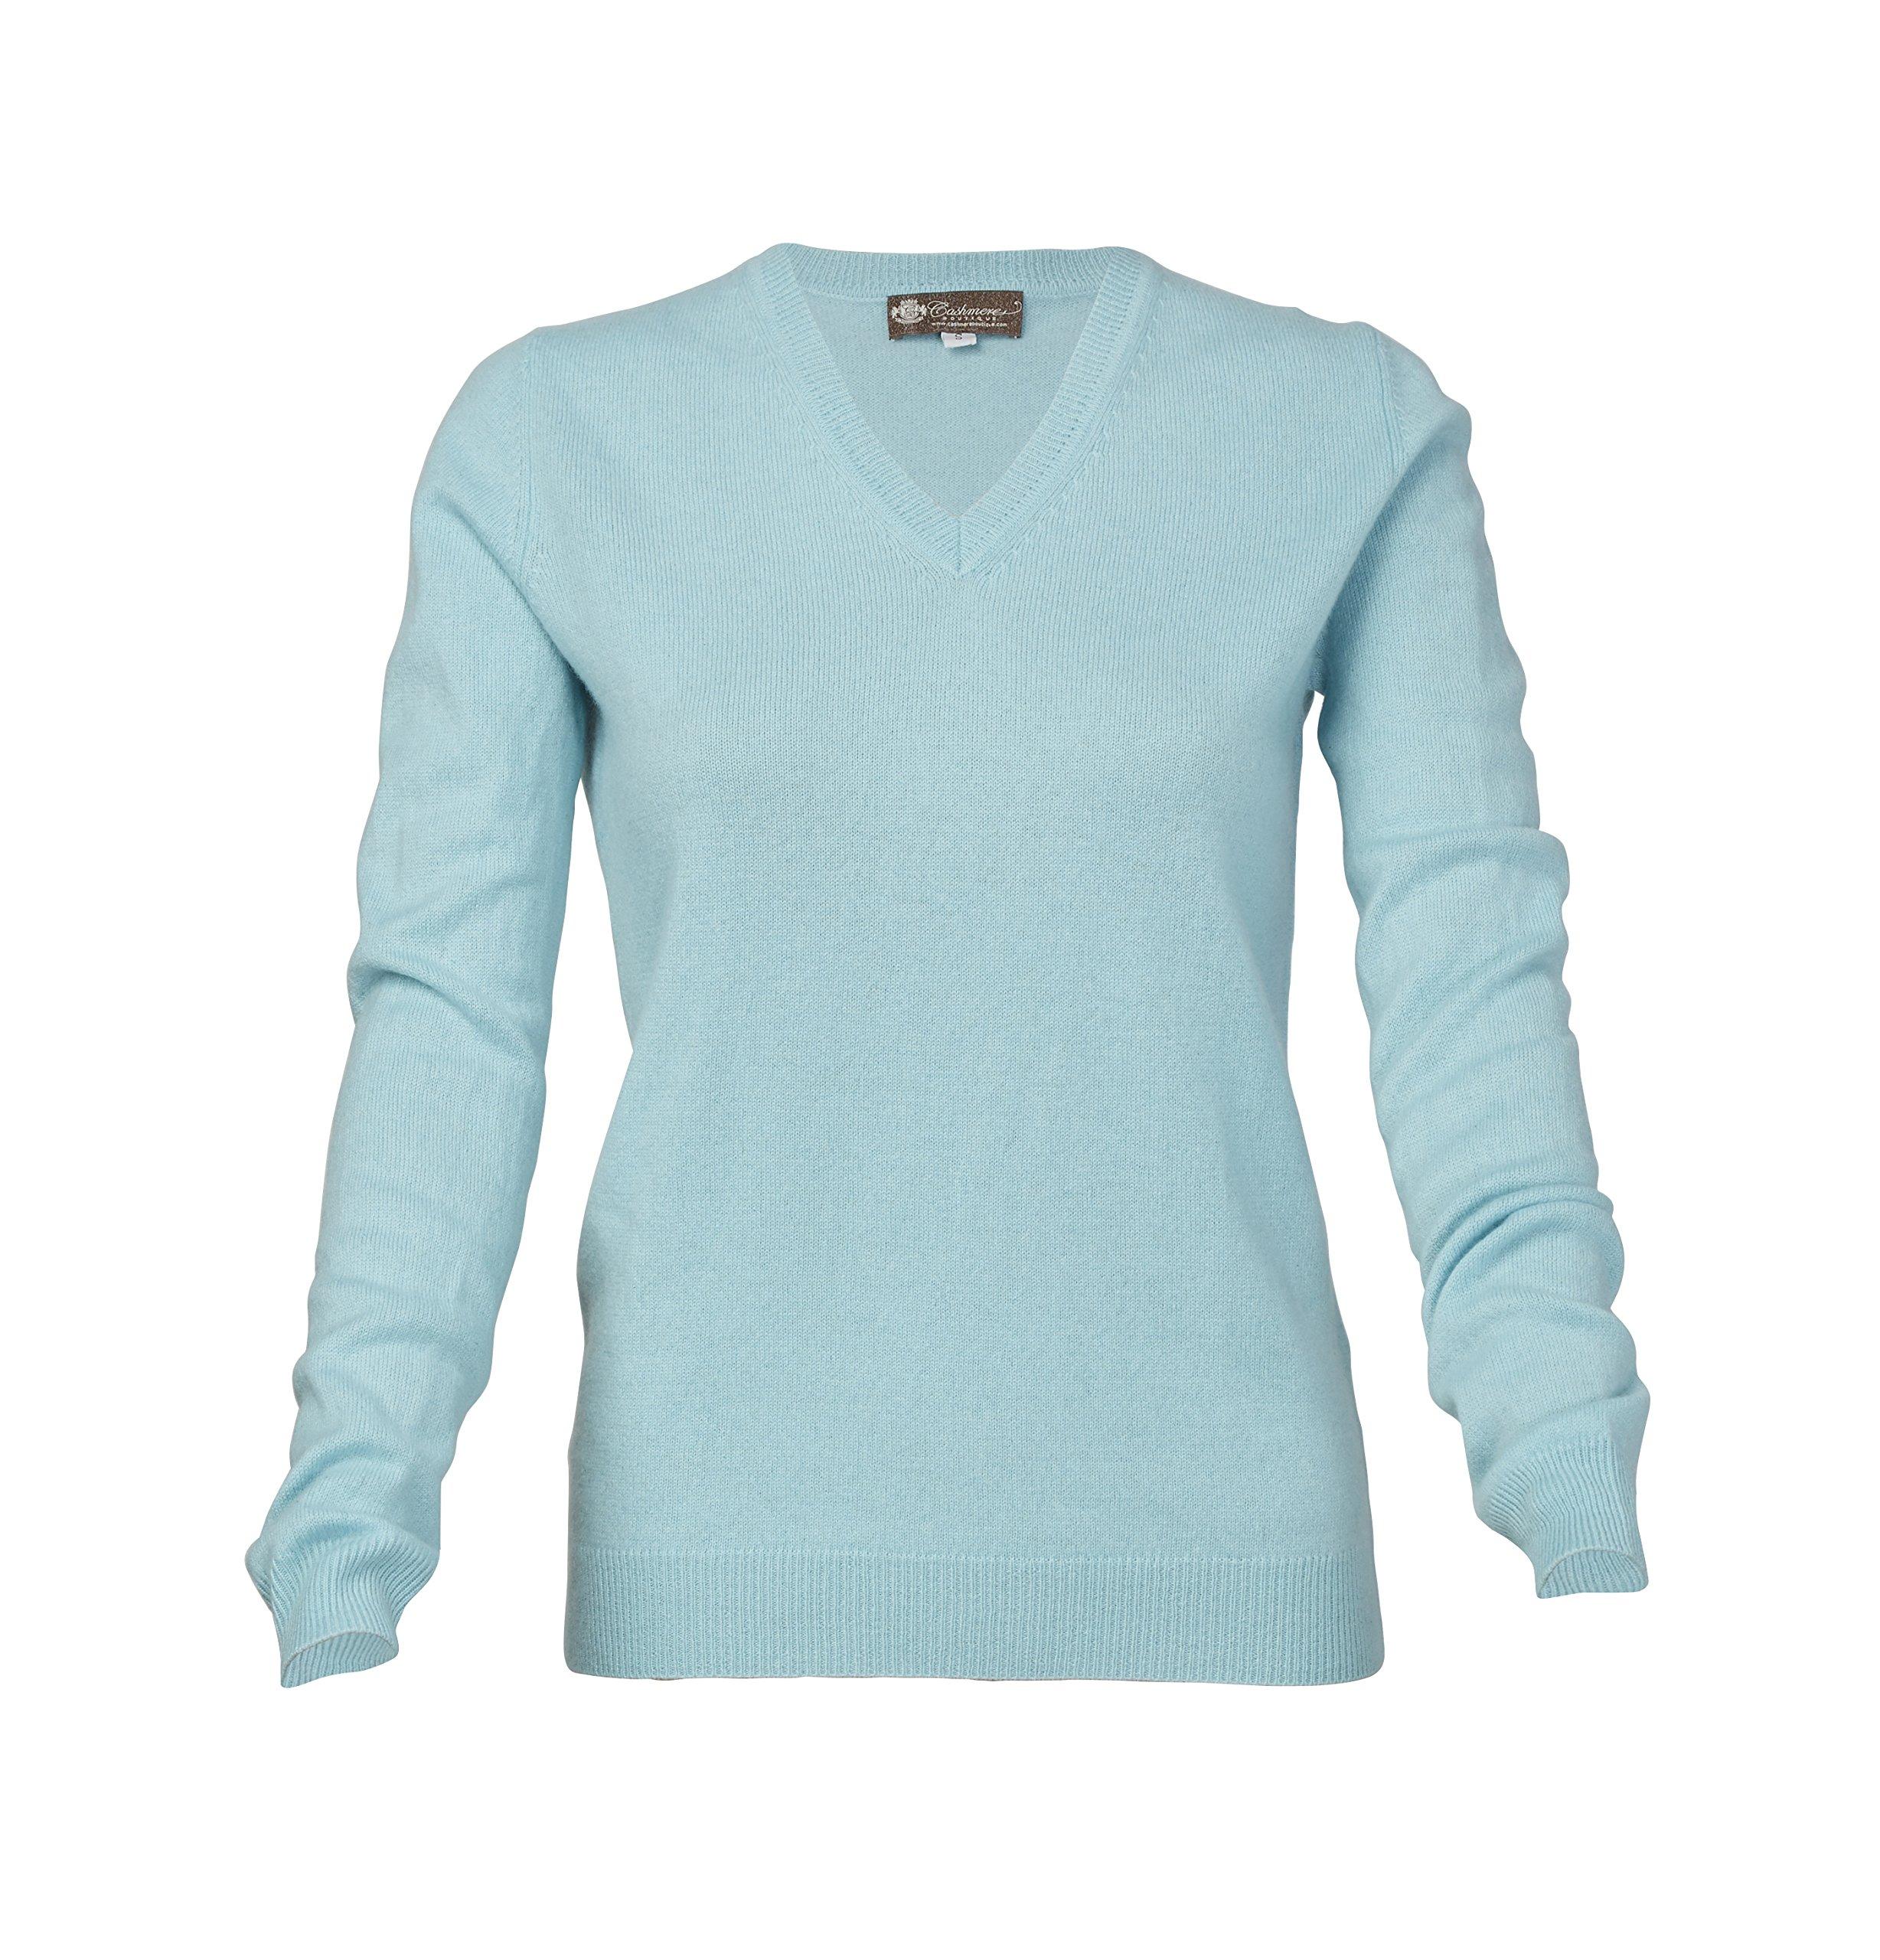 Women's Cashmere V-Neck Sweater (Blue Topaz, Medium)